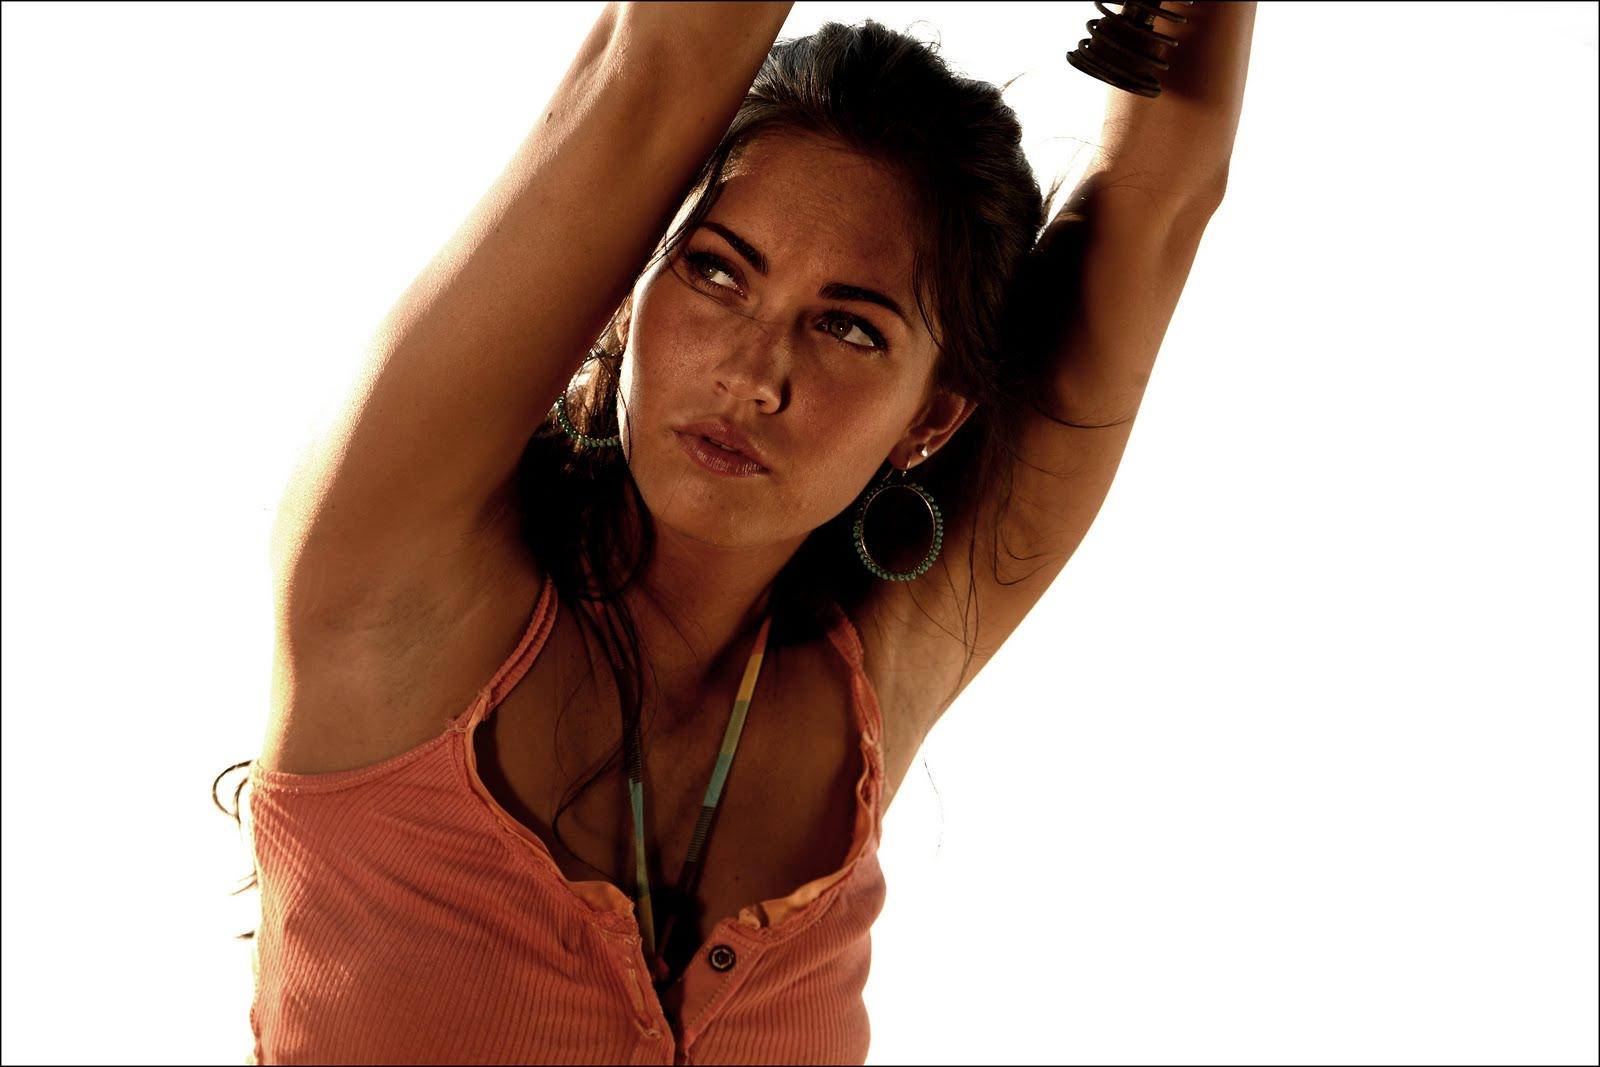 Megan Fox - Transformers - Wide Wallpaper | Hd Desktop ...